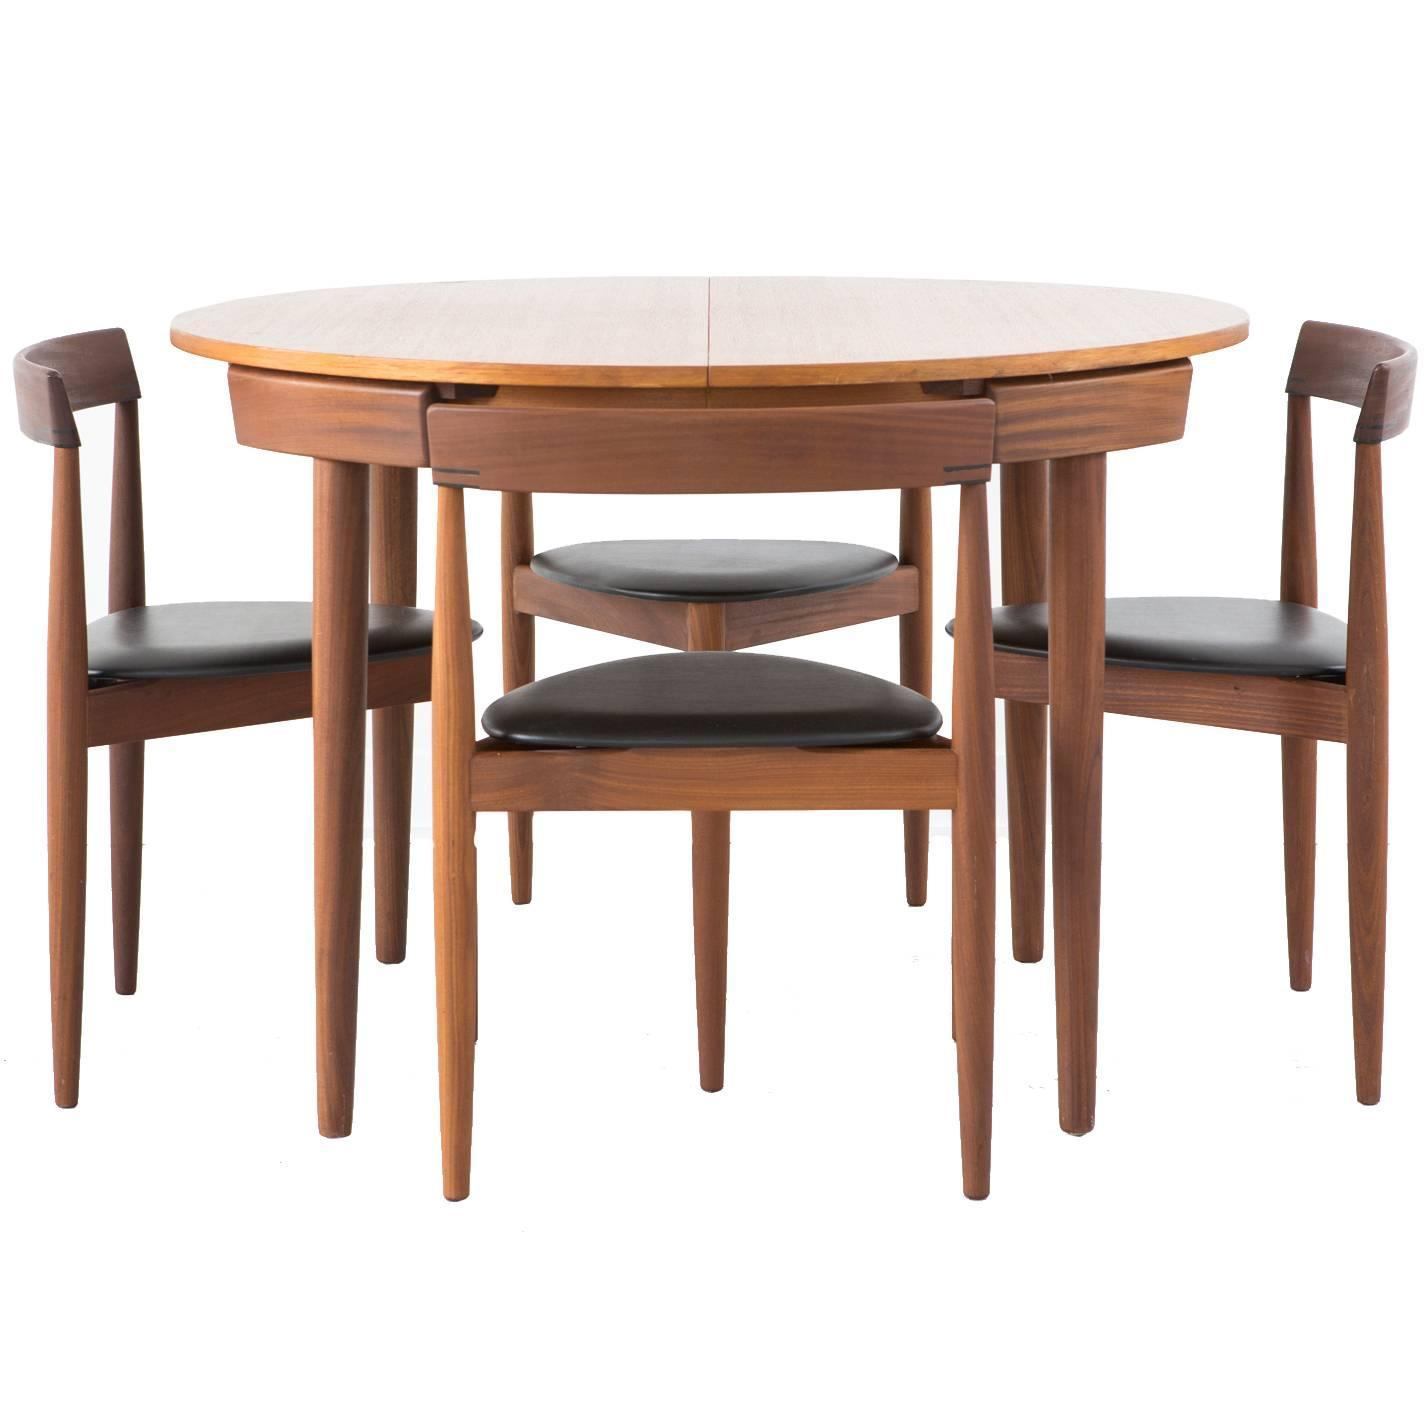 Mid Century Modern Teak Dining Set : 160904Rachman0365SMALLorgz from sgame.us size 1427 x 1427 jpeg 84kB